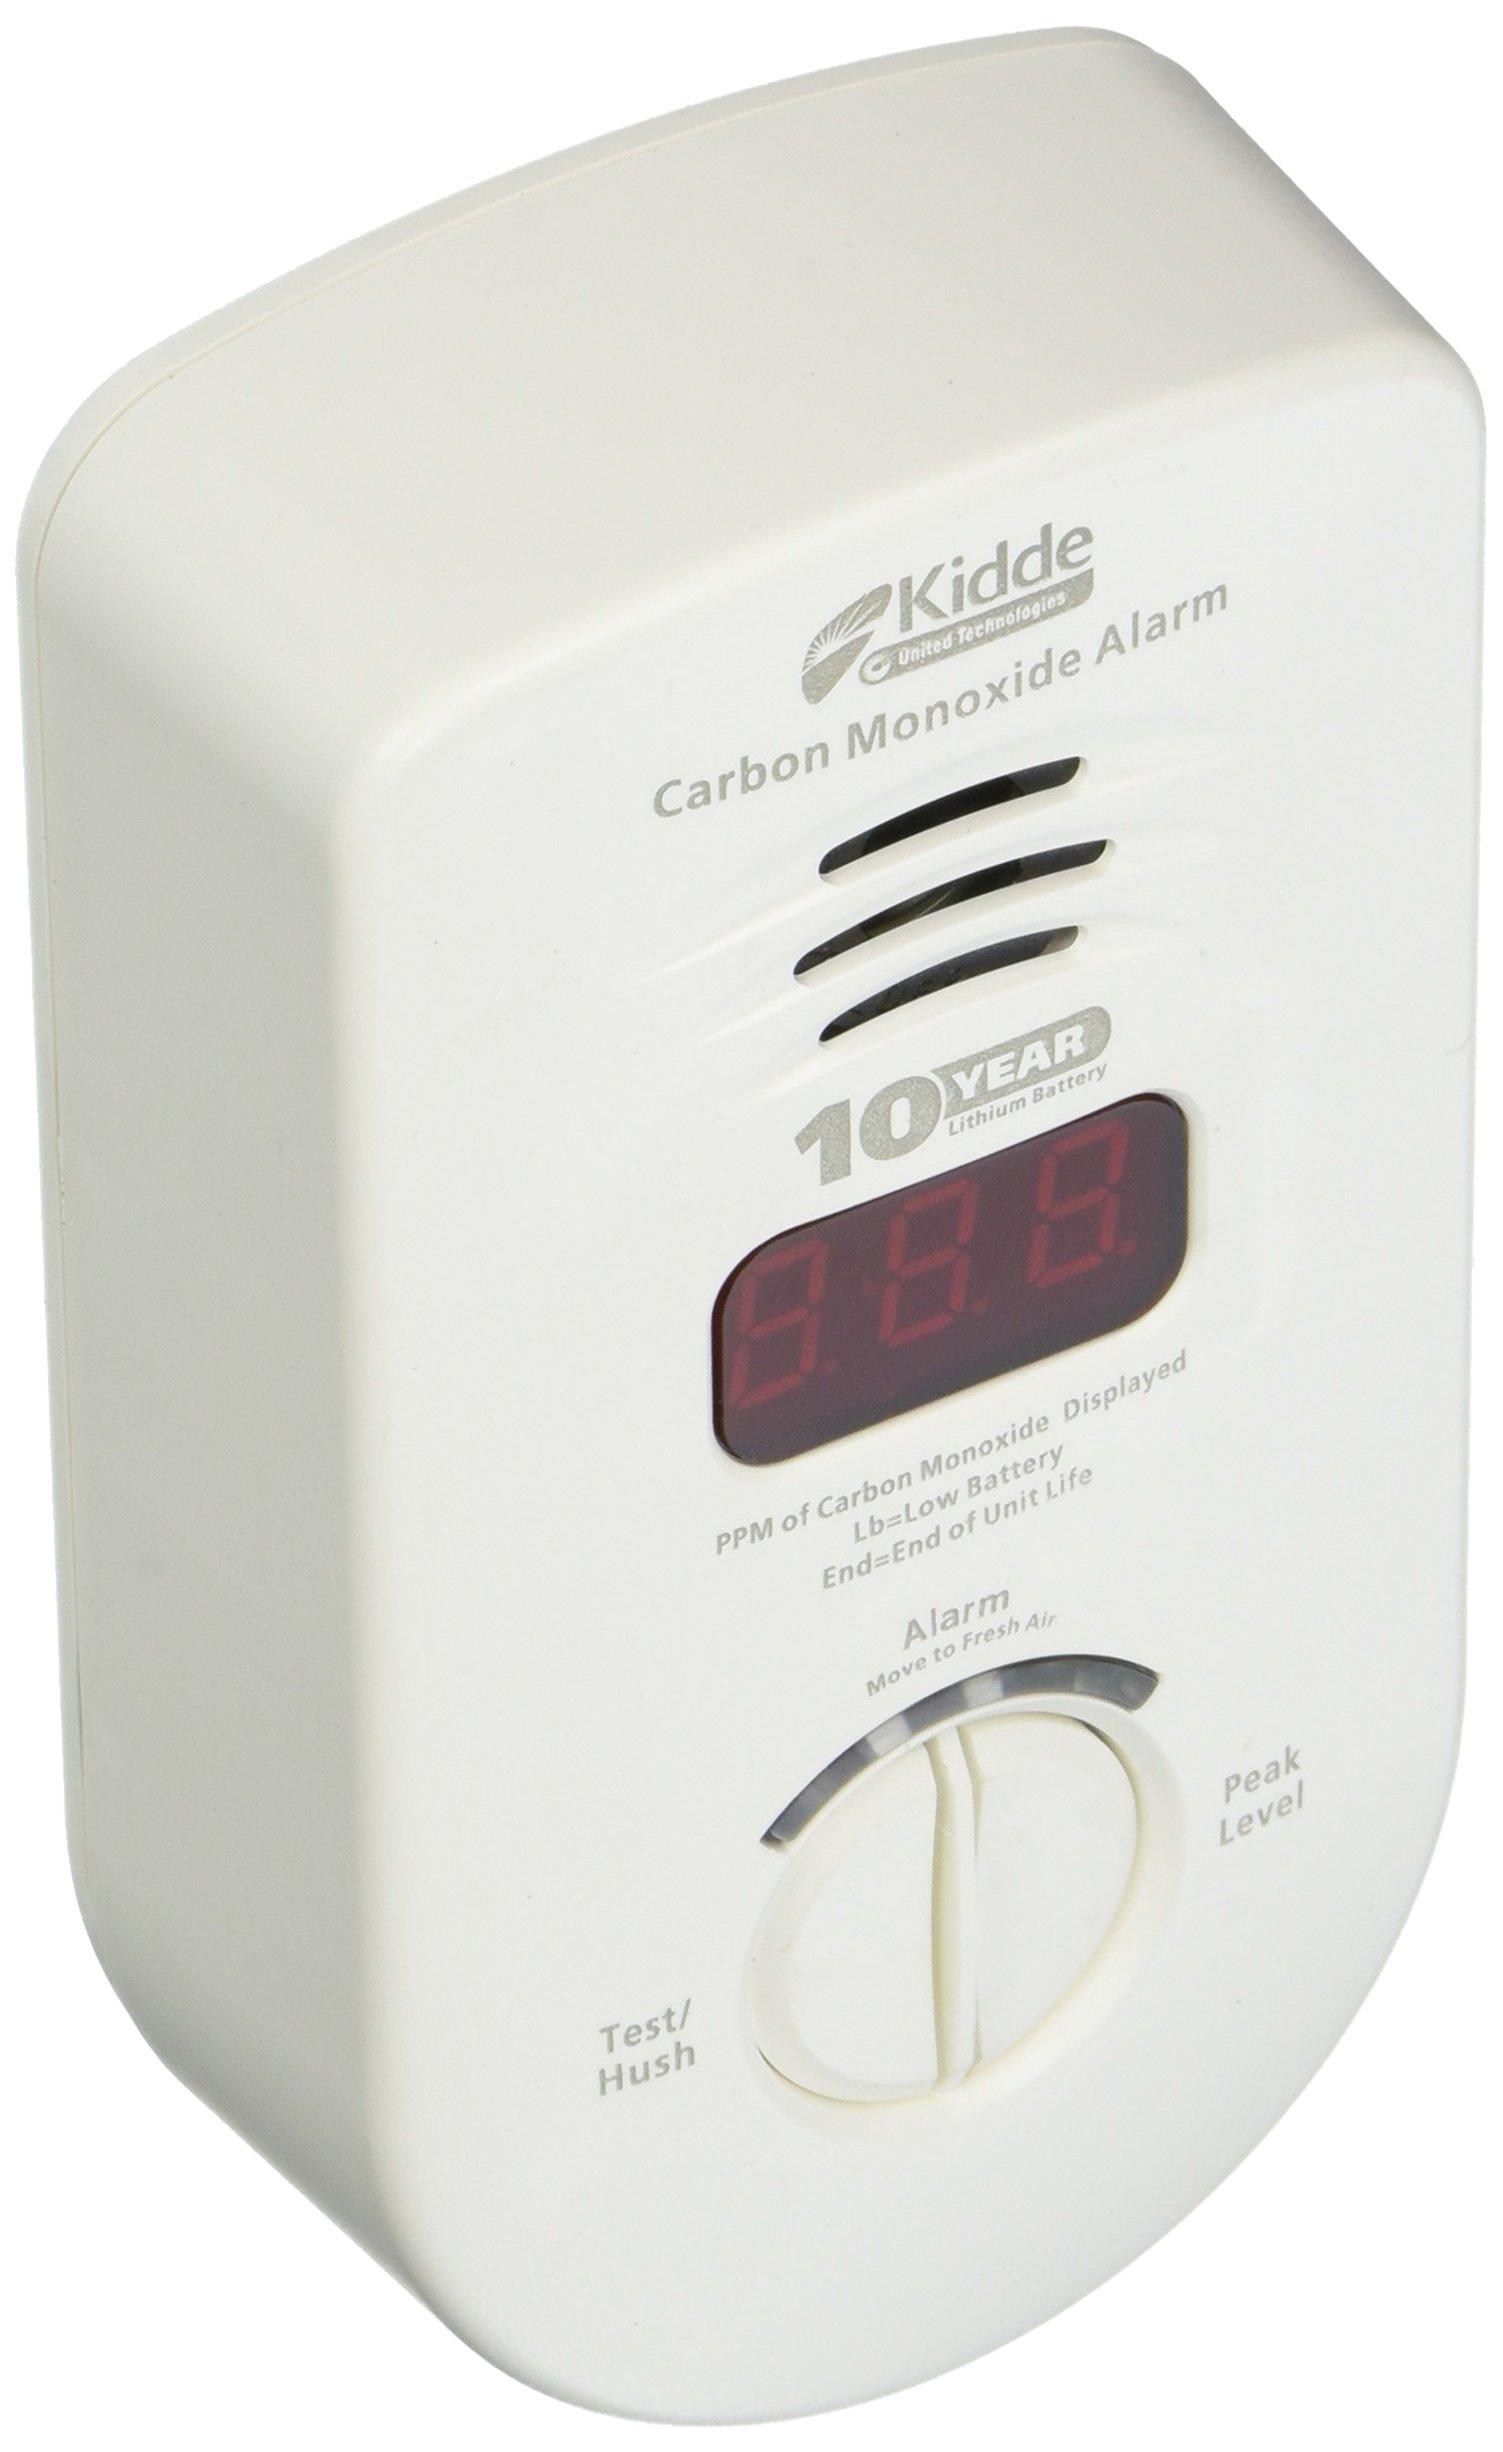 KIDDE 21026350 Plug In Carbon Monoxide Alarm with Sealed Lithium Battery Back Up